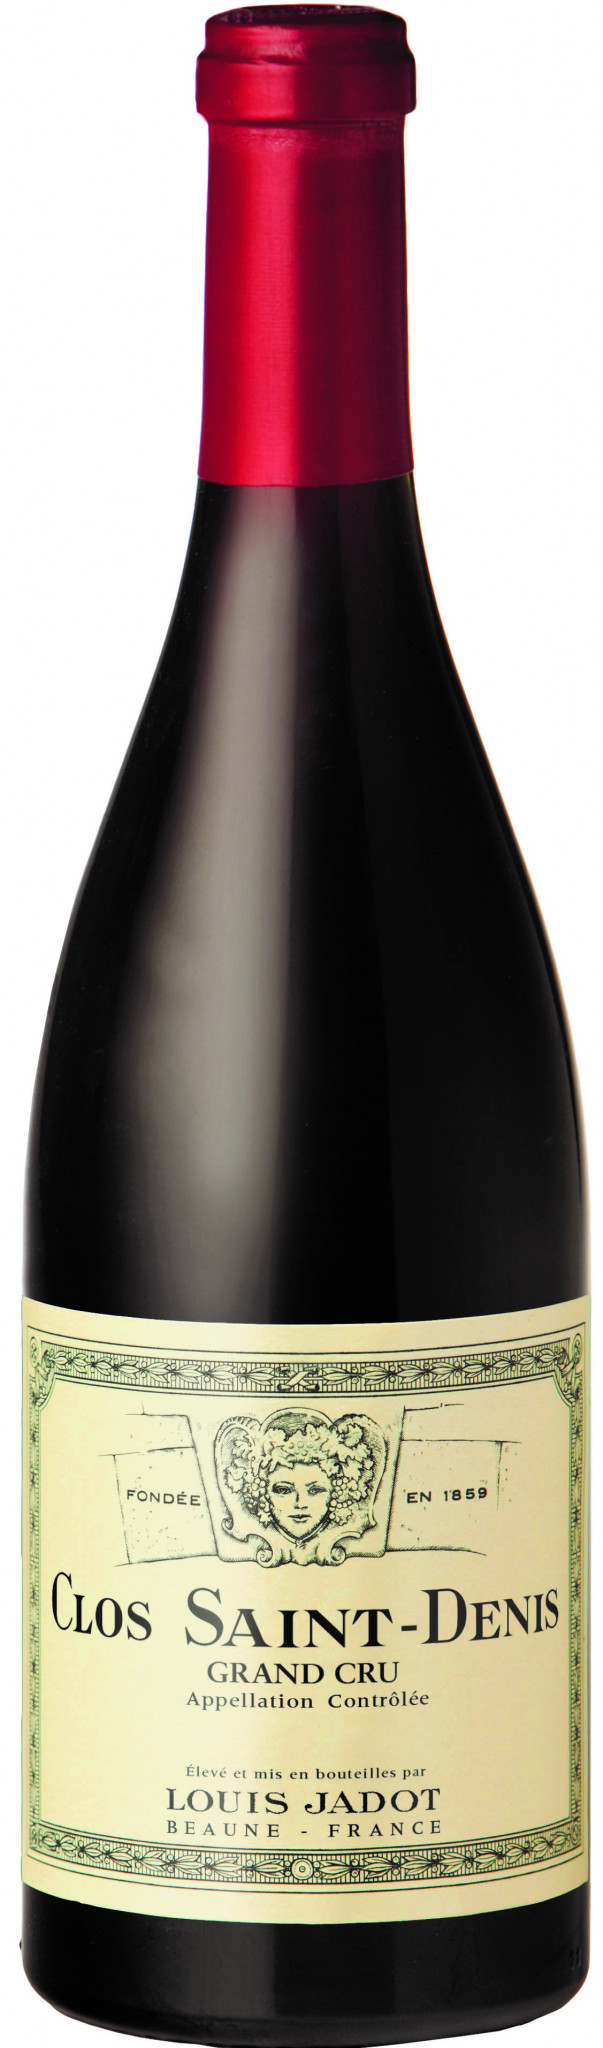 Jadot Clos Saint-Denis_wineaffair